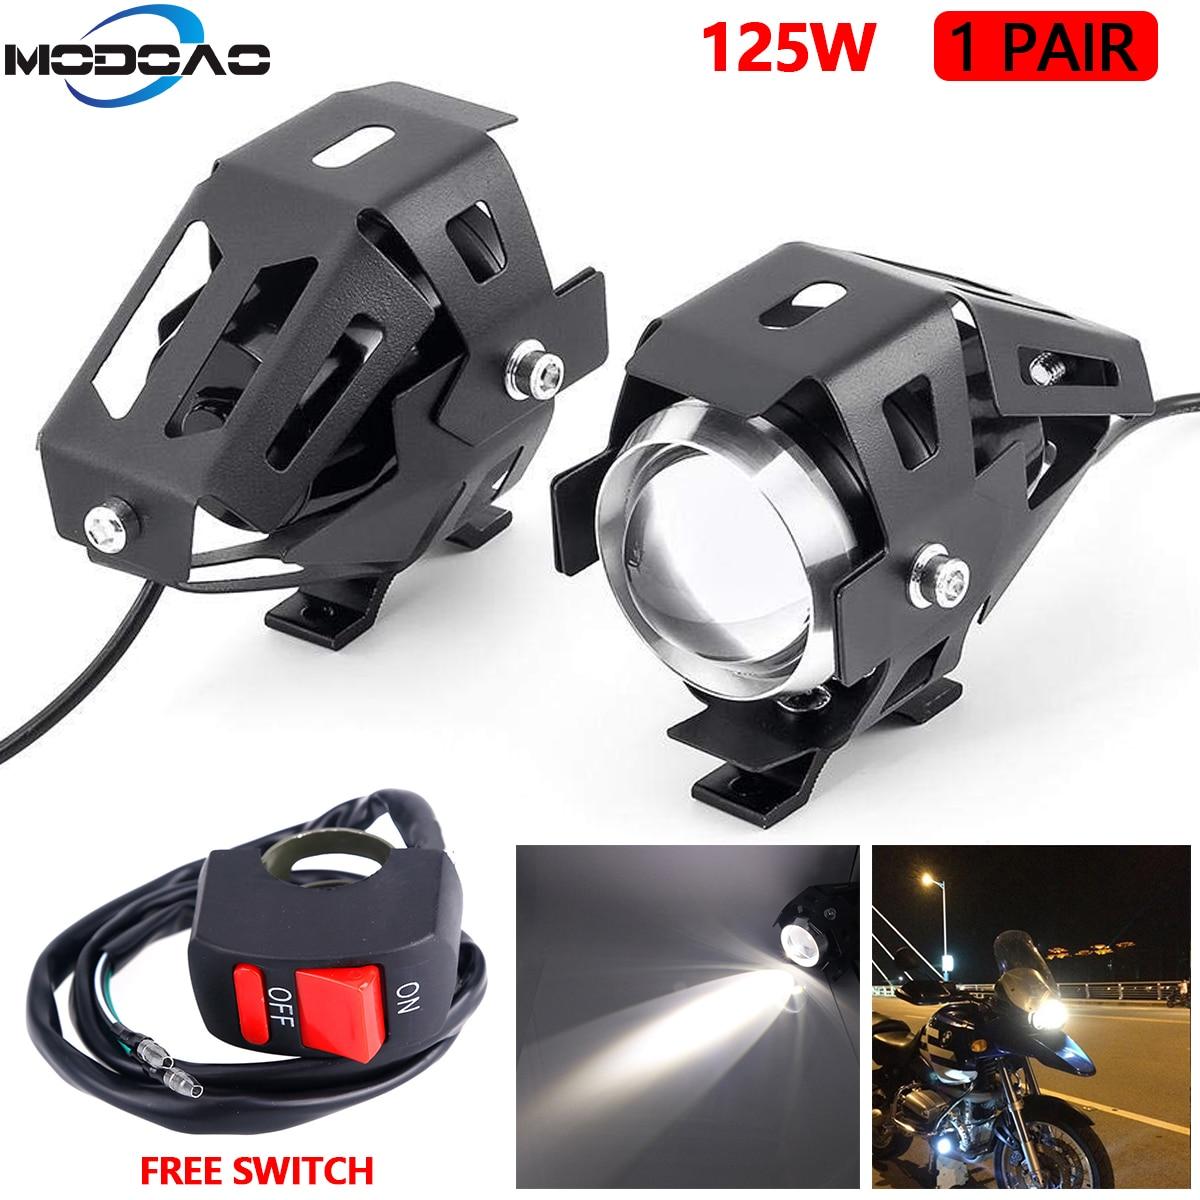 2PCS 125W U5 Motorcycle Headlights Universal Auxiliary White Lamp LED Motorbike Spotlight Accessories Moto DRL Spot Head Lights